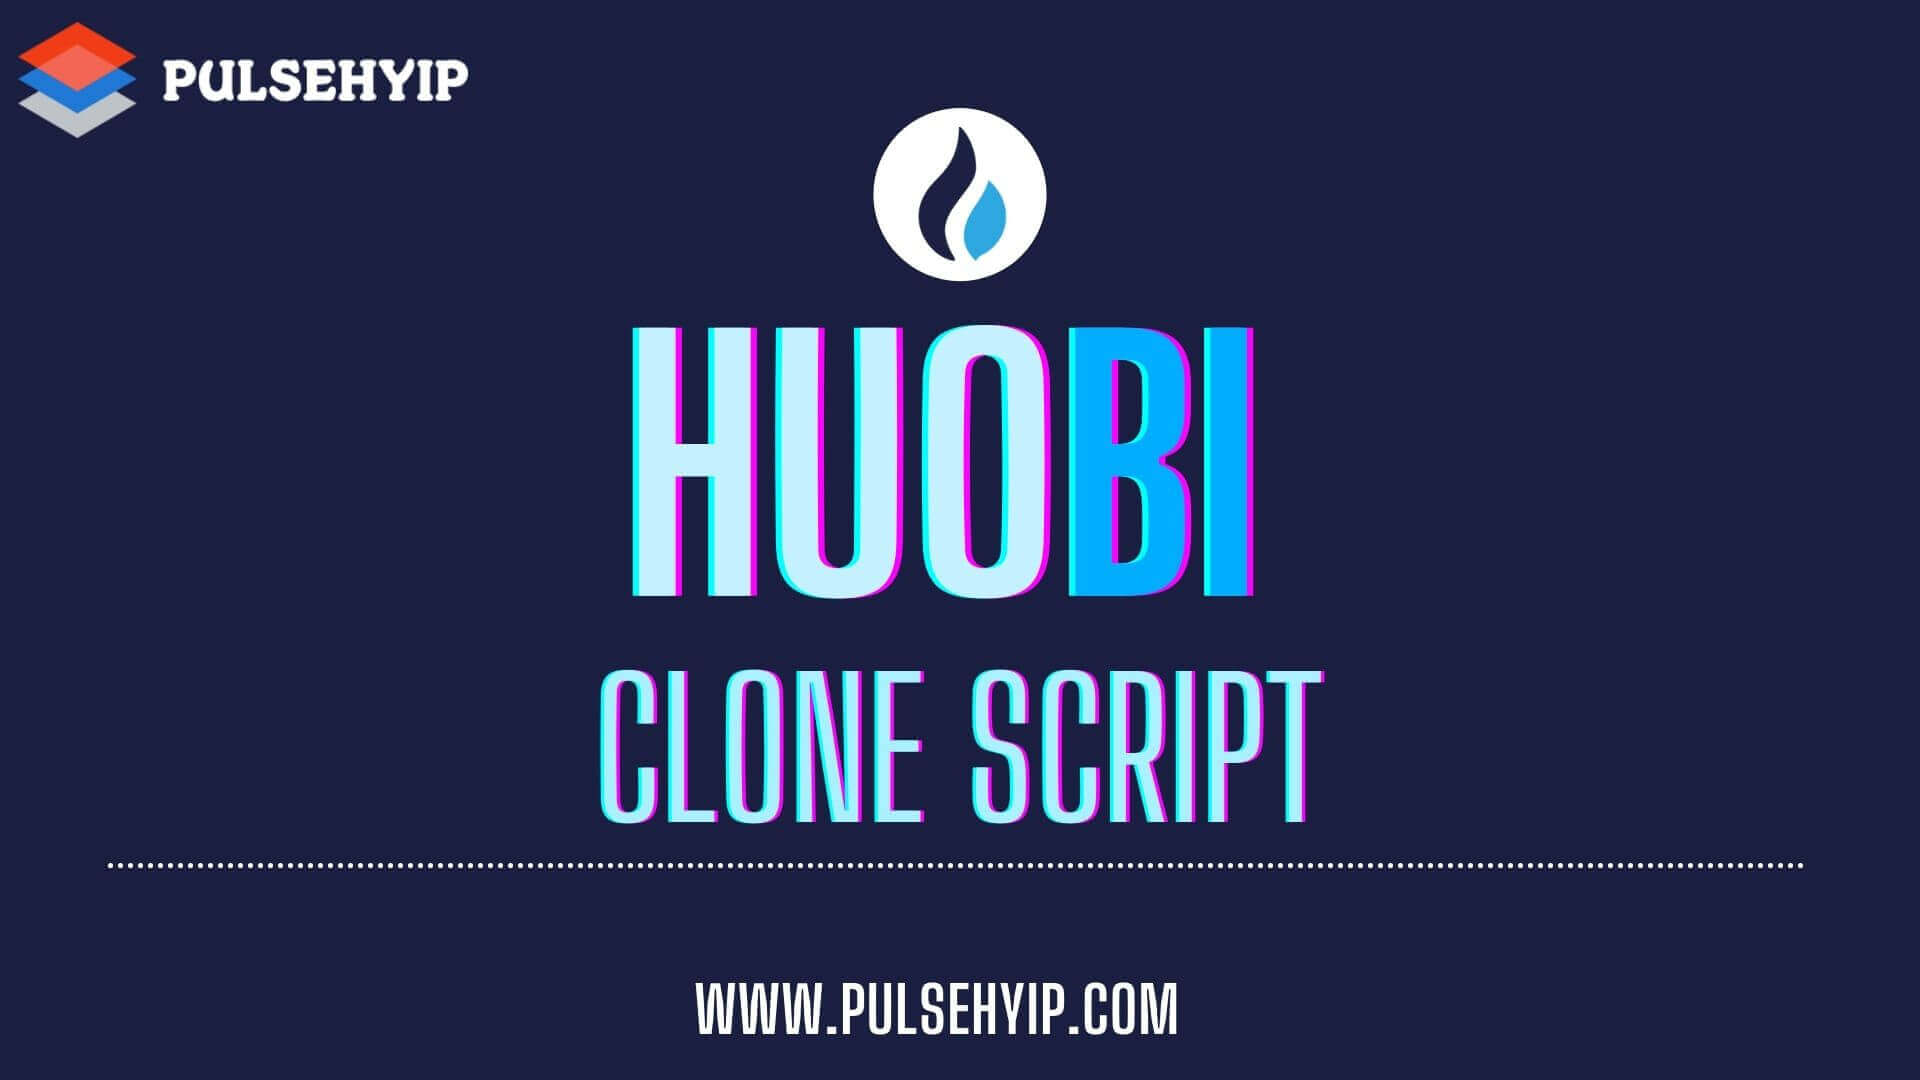 Huobi Clone Script to Launch Global Cryptocurrency Exchange Platform like Huobi